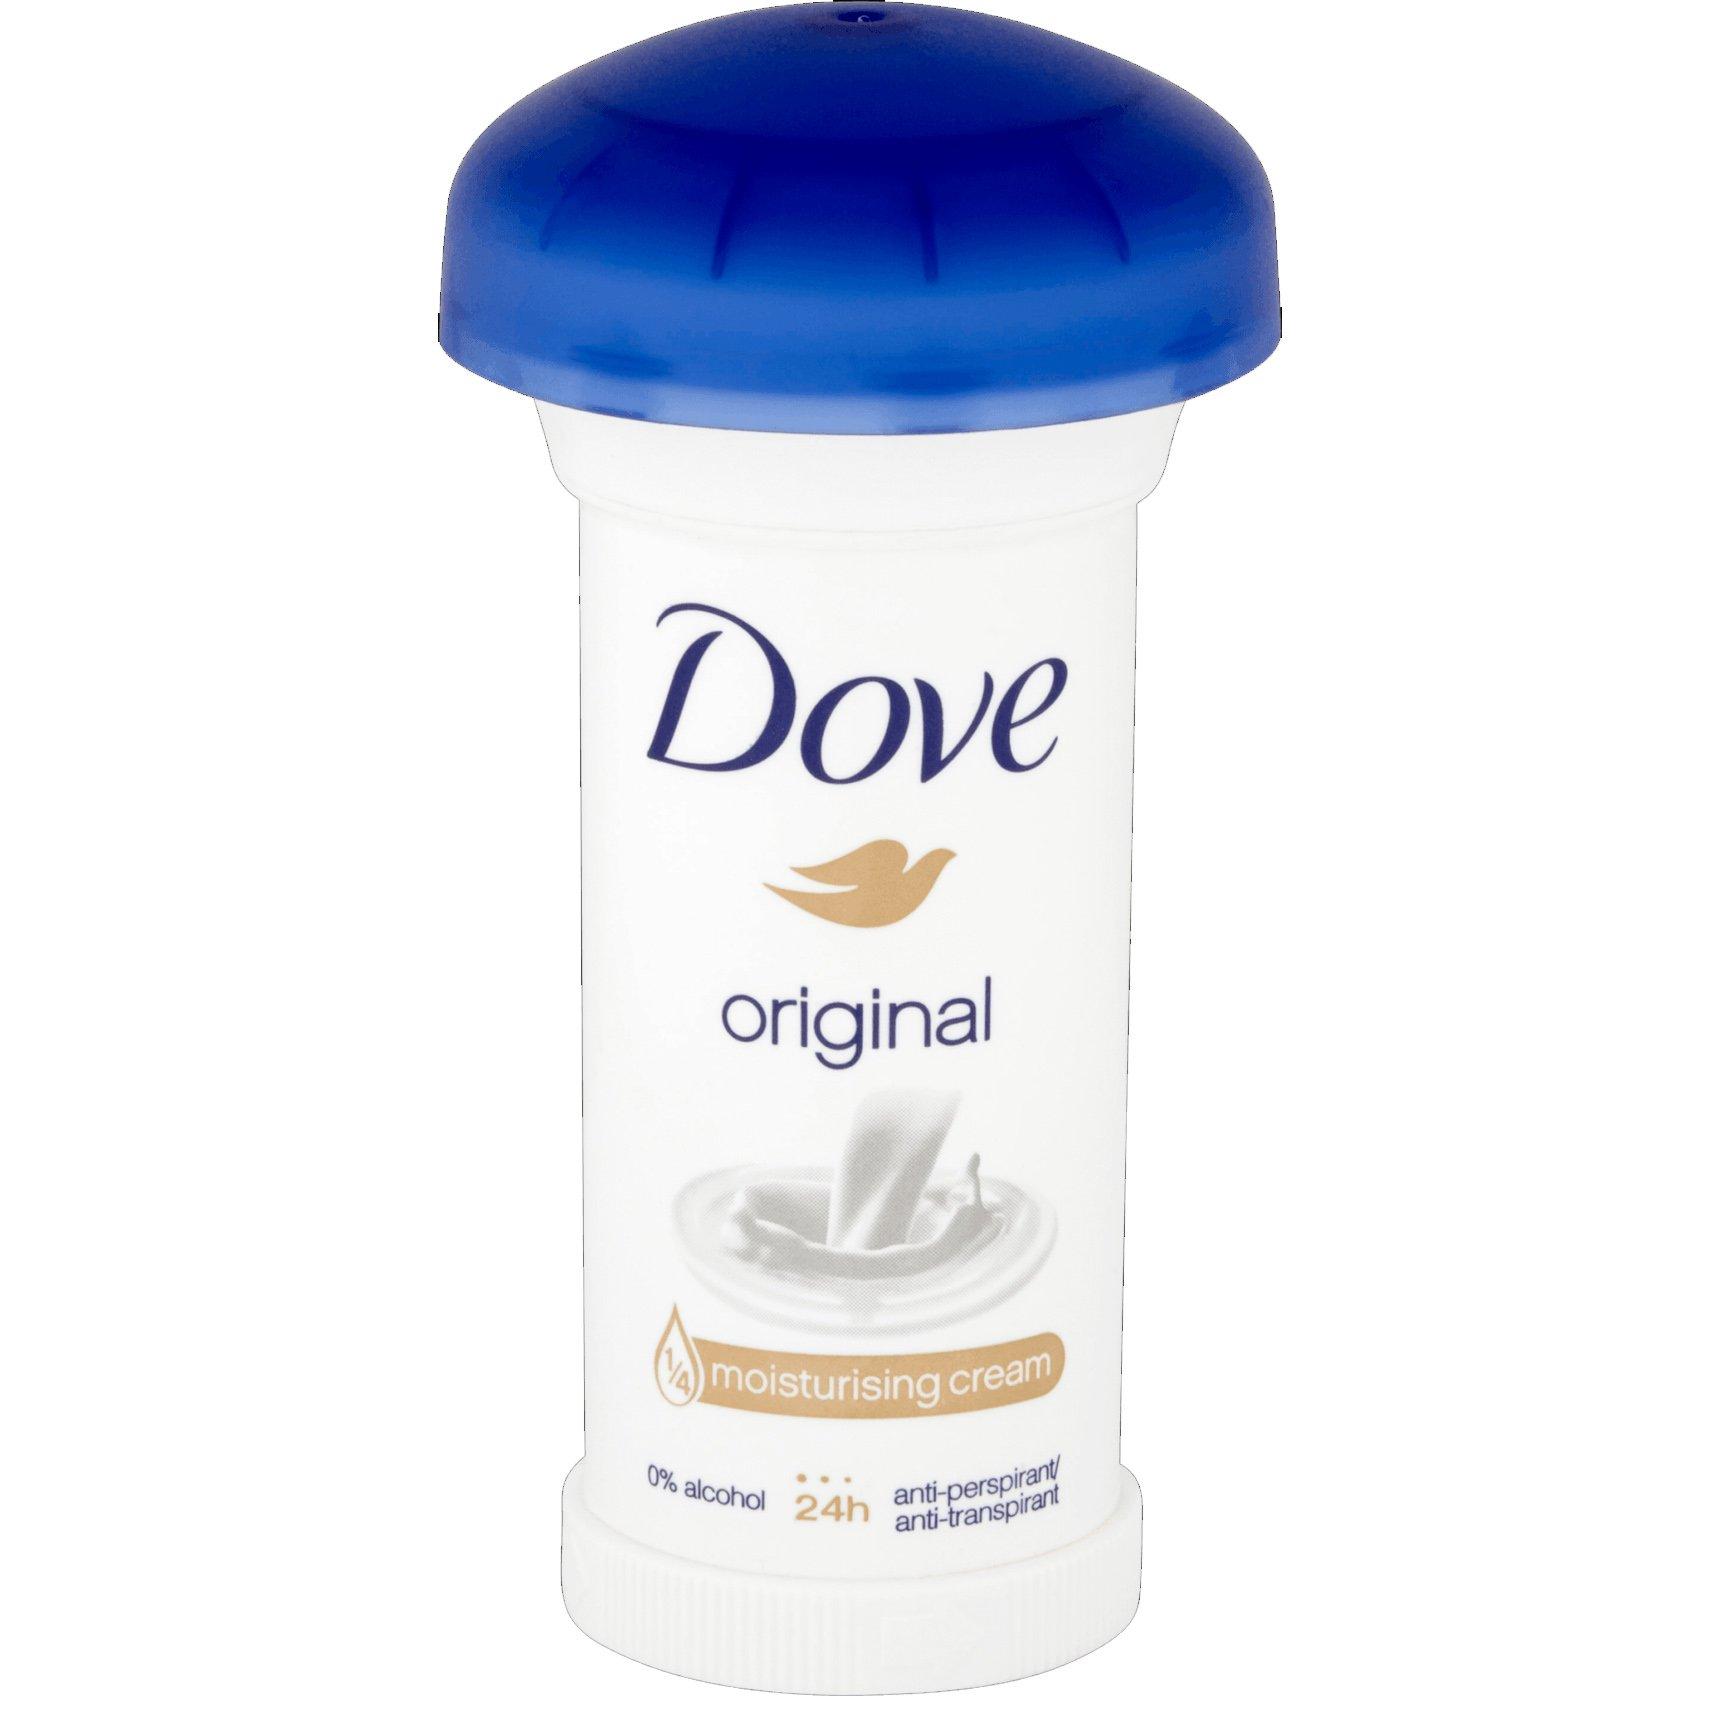 Dove Deodorant Stick Original 24h Αποσμητικό 24ωρης Αντιιδρωτικής Προστασίας με Διακριτικό Άρωμα 50ml